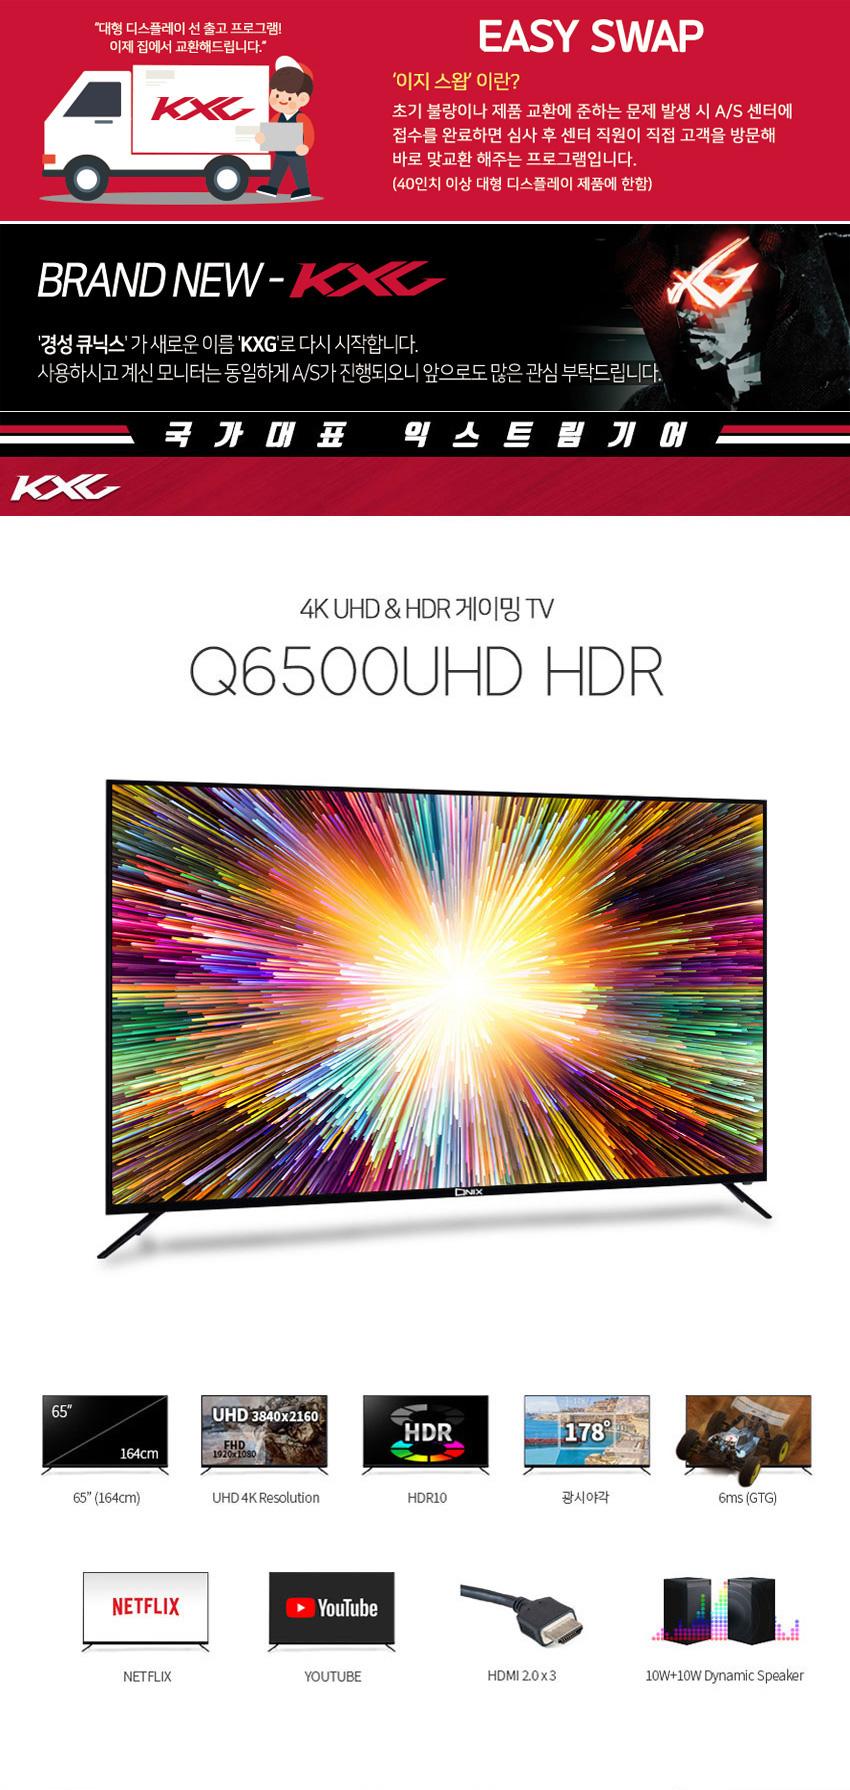 KSGK Q6500UHD HDR (벽걸이)